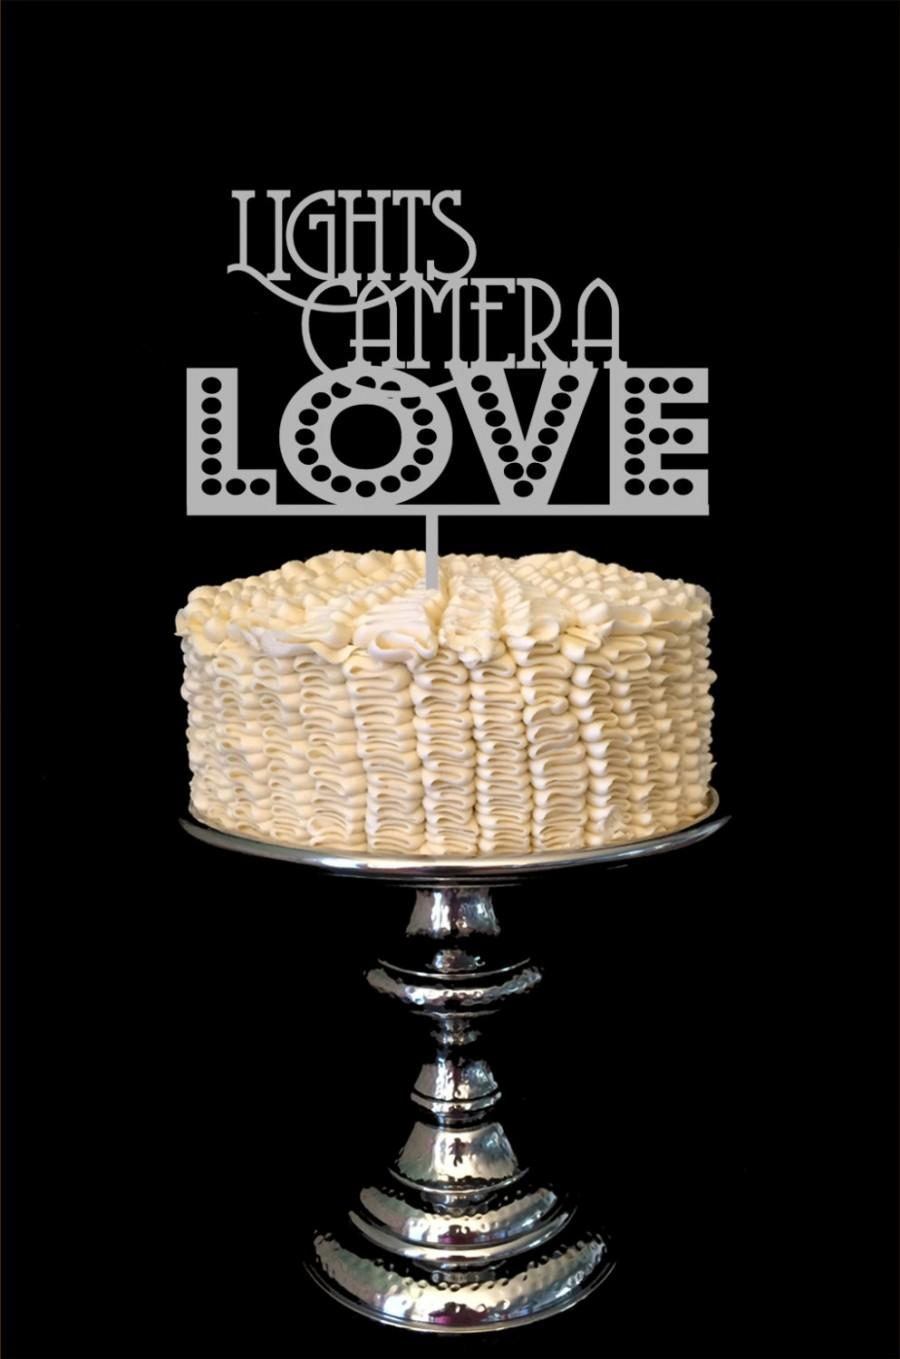 Mariage - Wedding Cake Topper Lights Camera LOVE Wood Custom Color Retro Movie